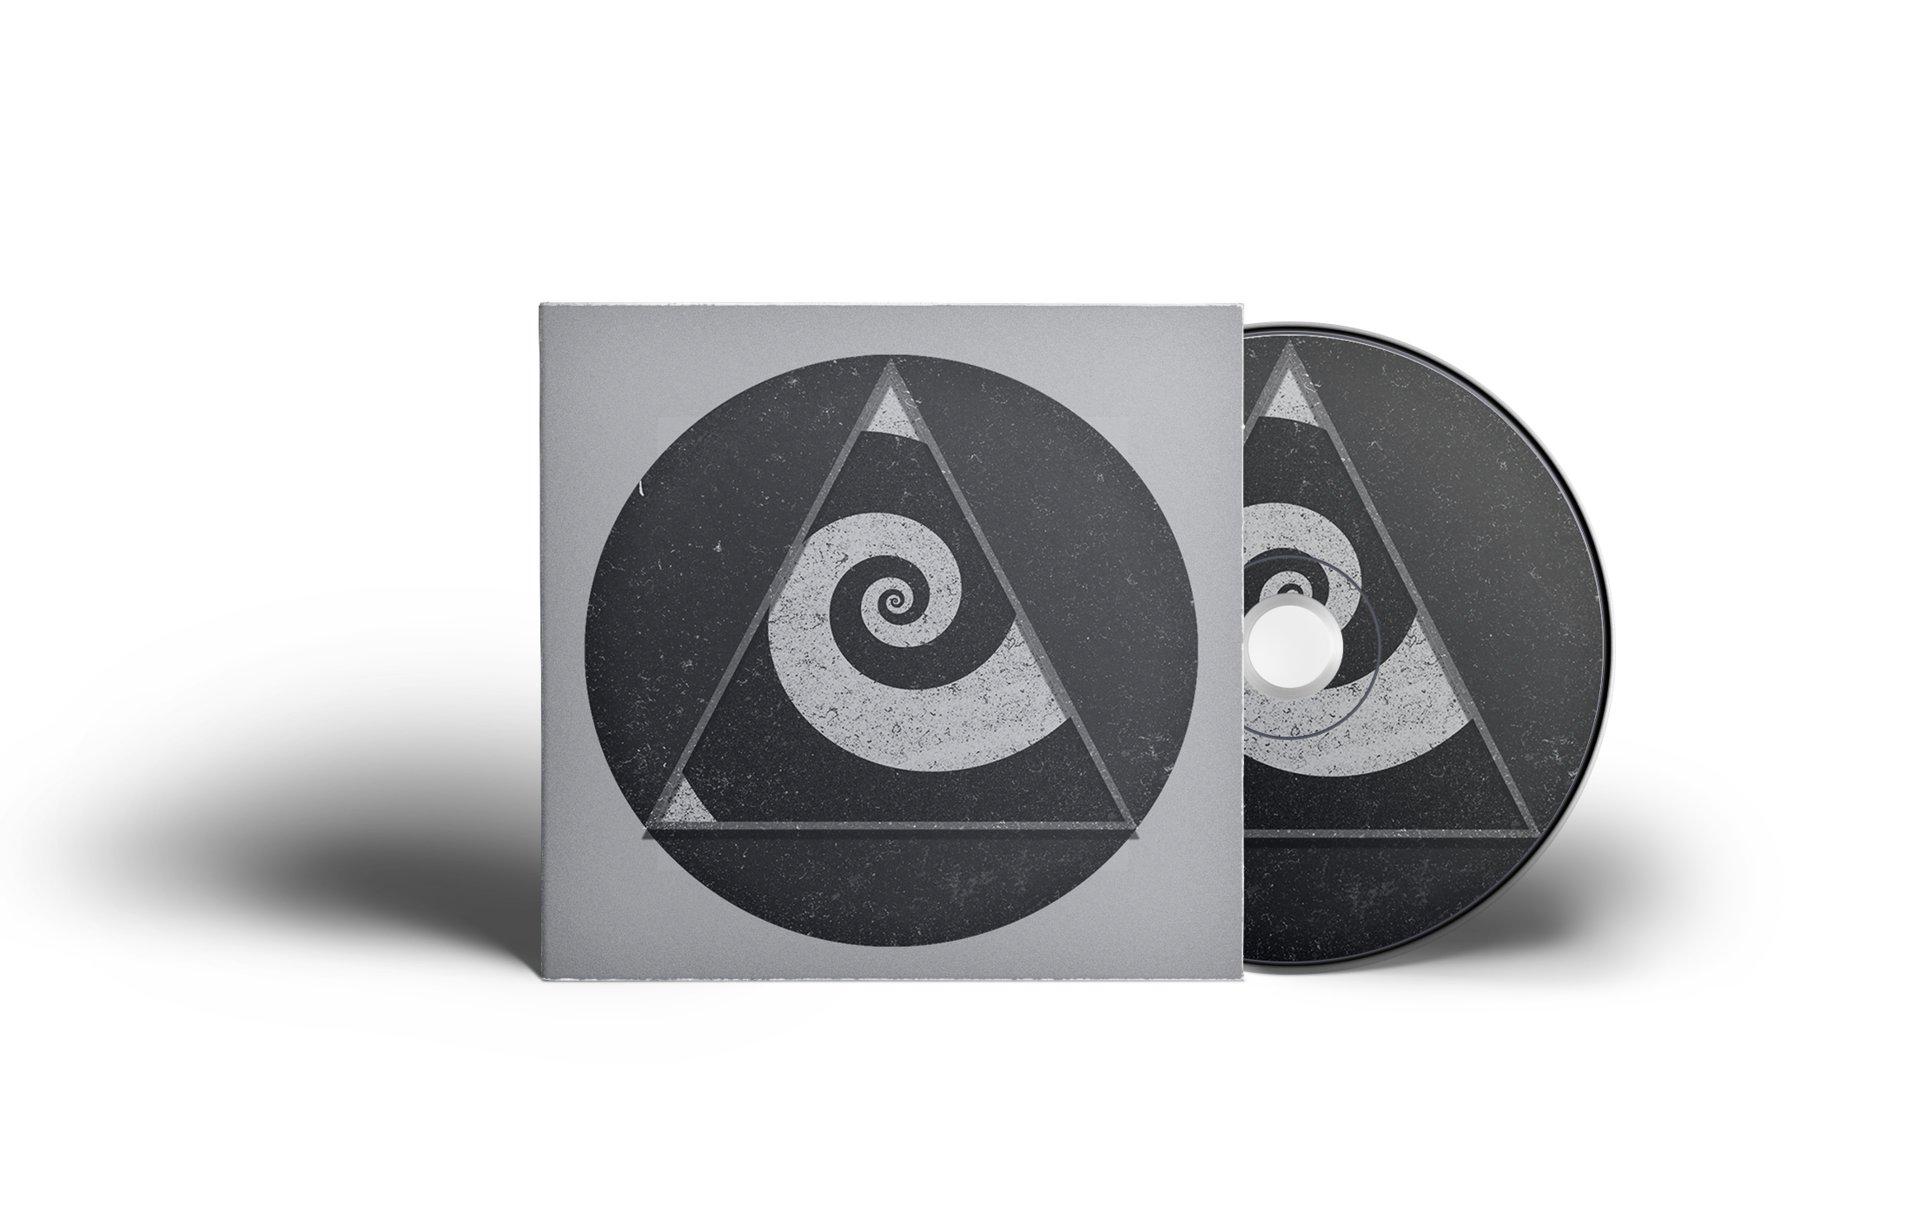 Raiyan momen disk and cover presentation mock up